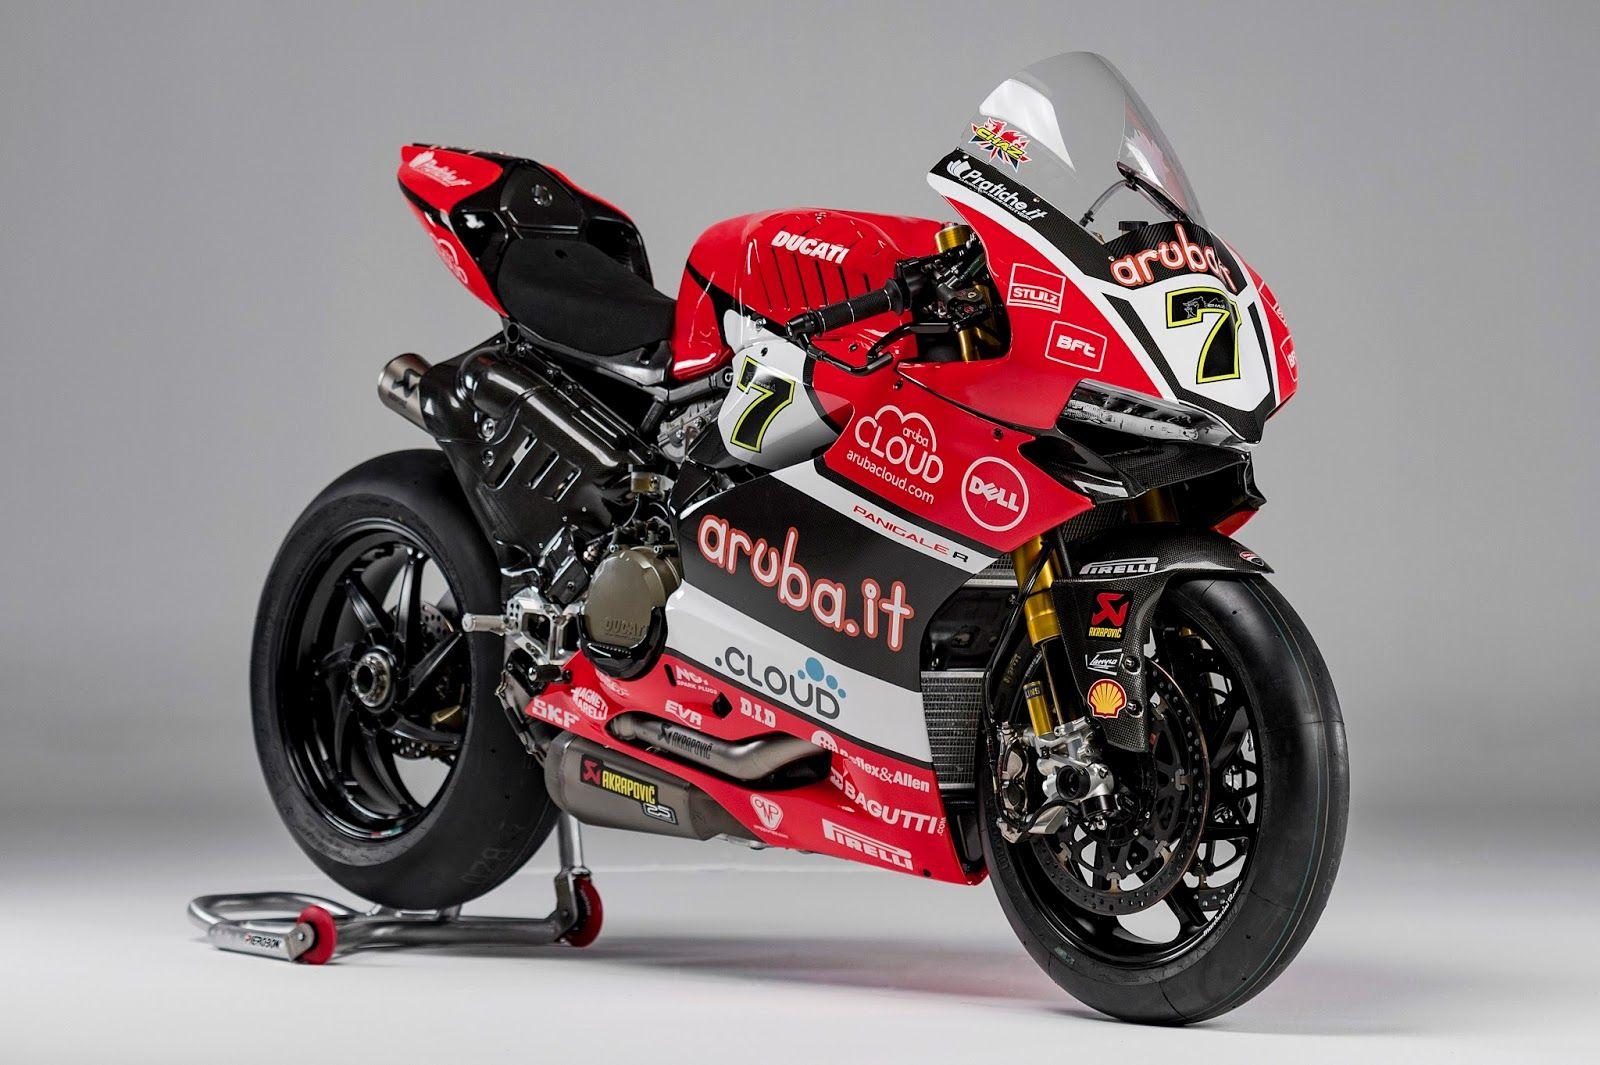 Racing Cafè: Ducati 1199 Panigale R Team Aruba.it Racing - Ducati WSBK 2016